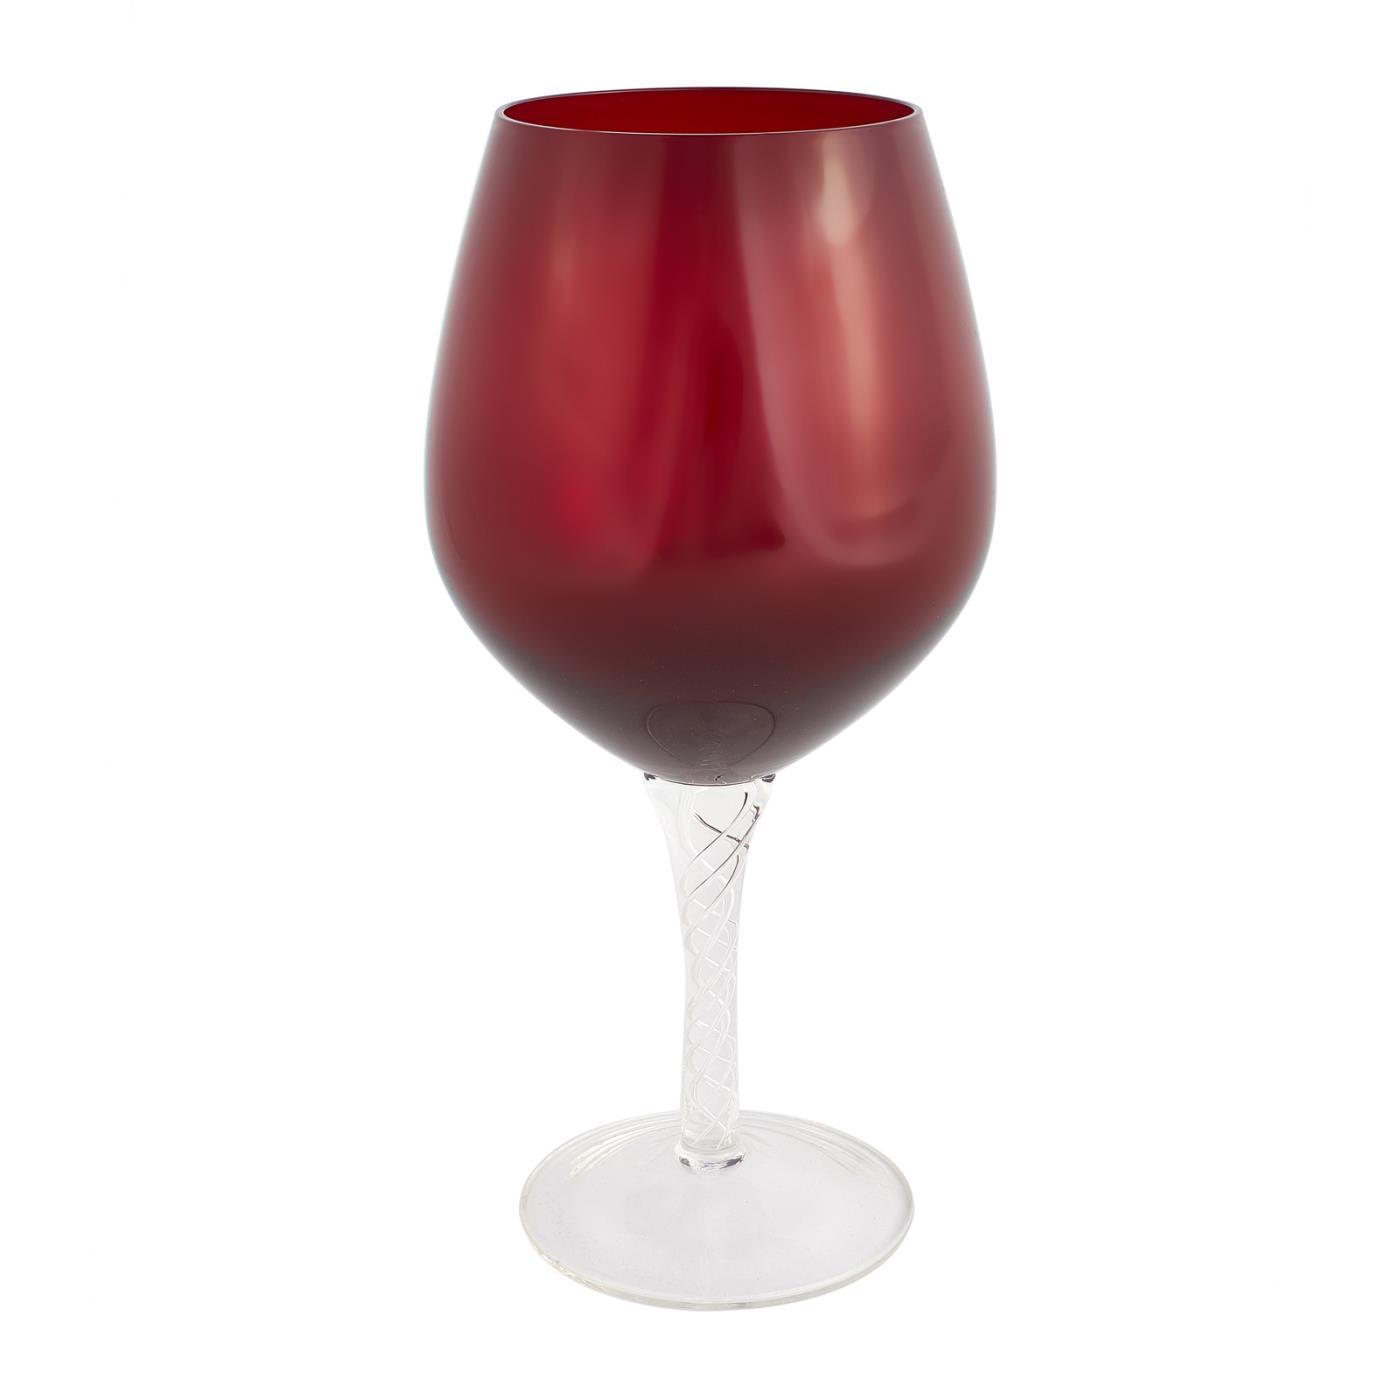 Braided Goblet - Red 20 oz